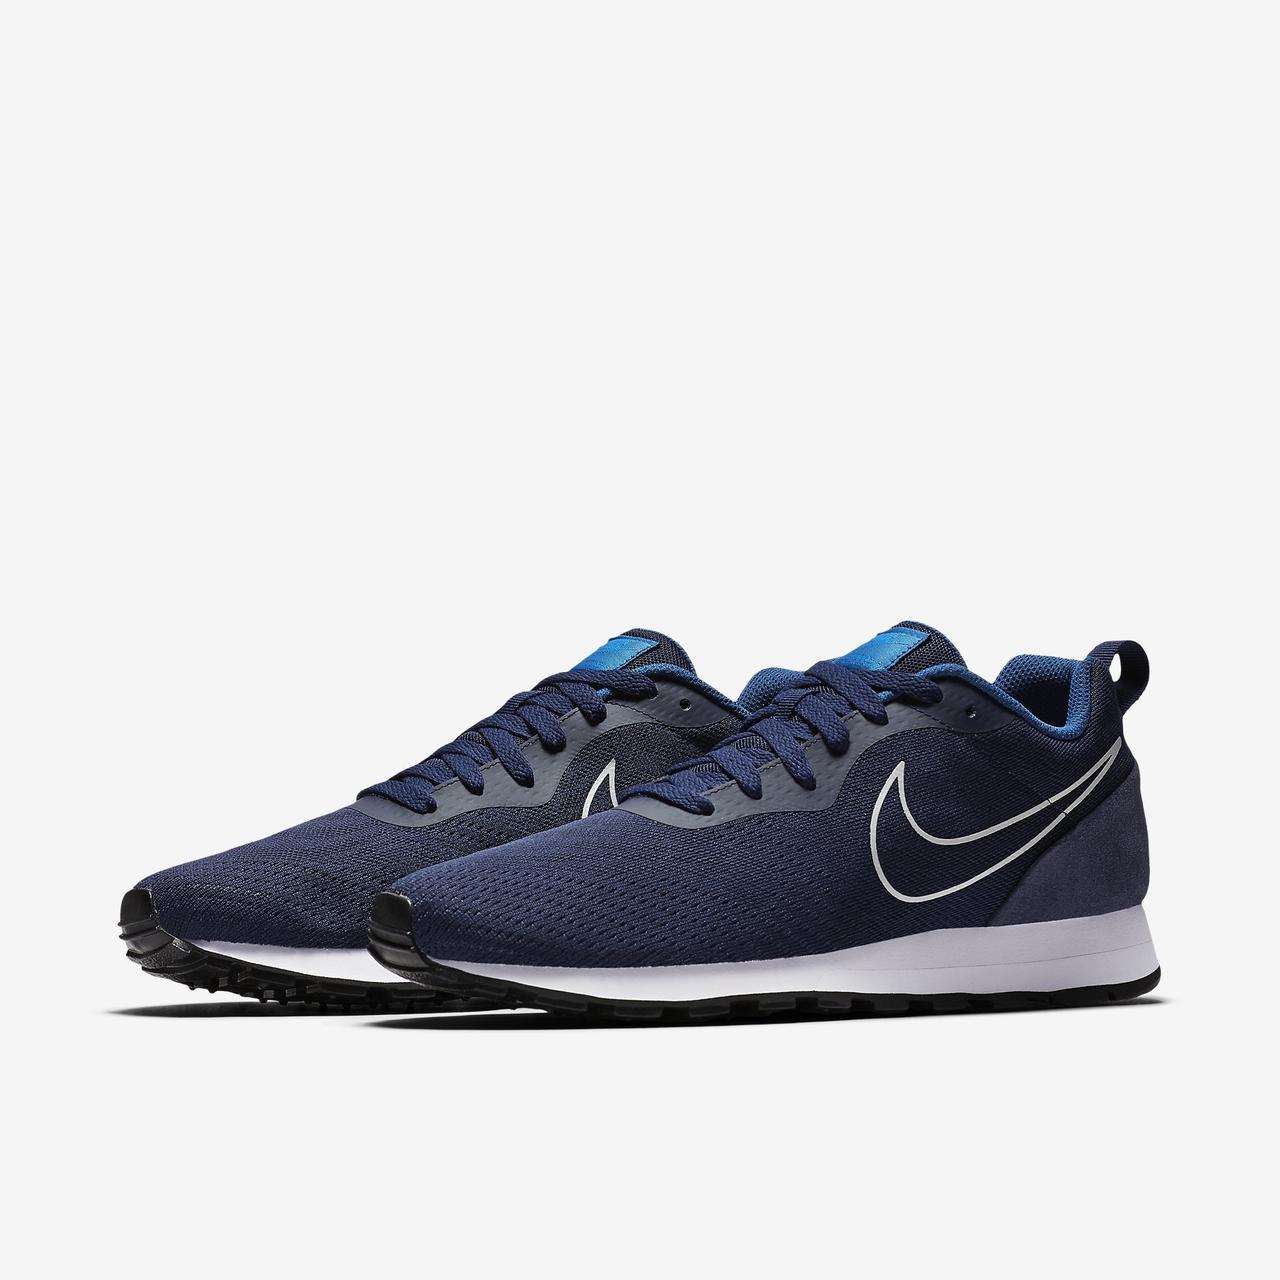 ecd26652 Кроссовки Nike MD Runner 2 902815-400 Оригинал -